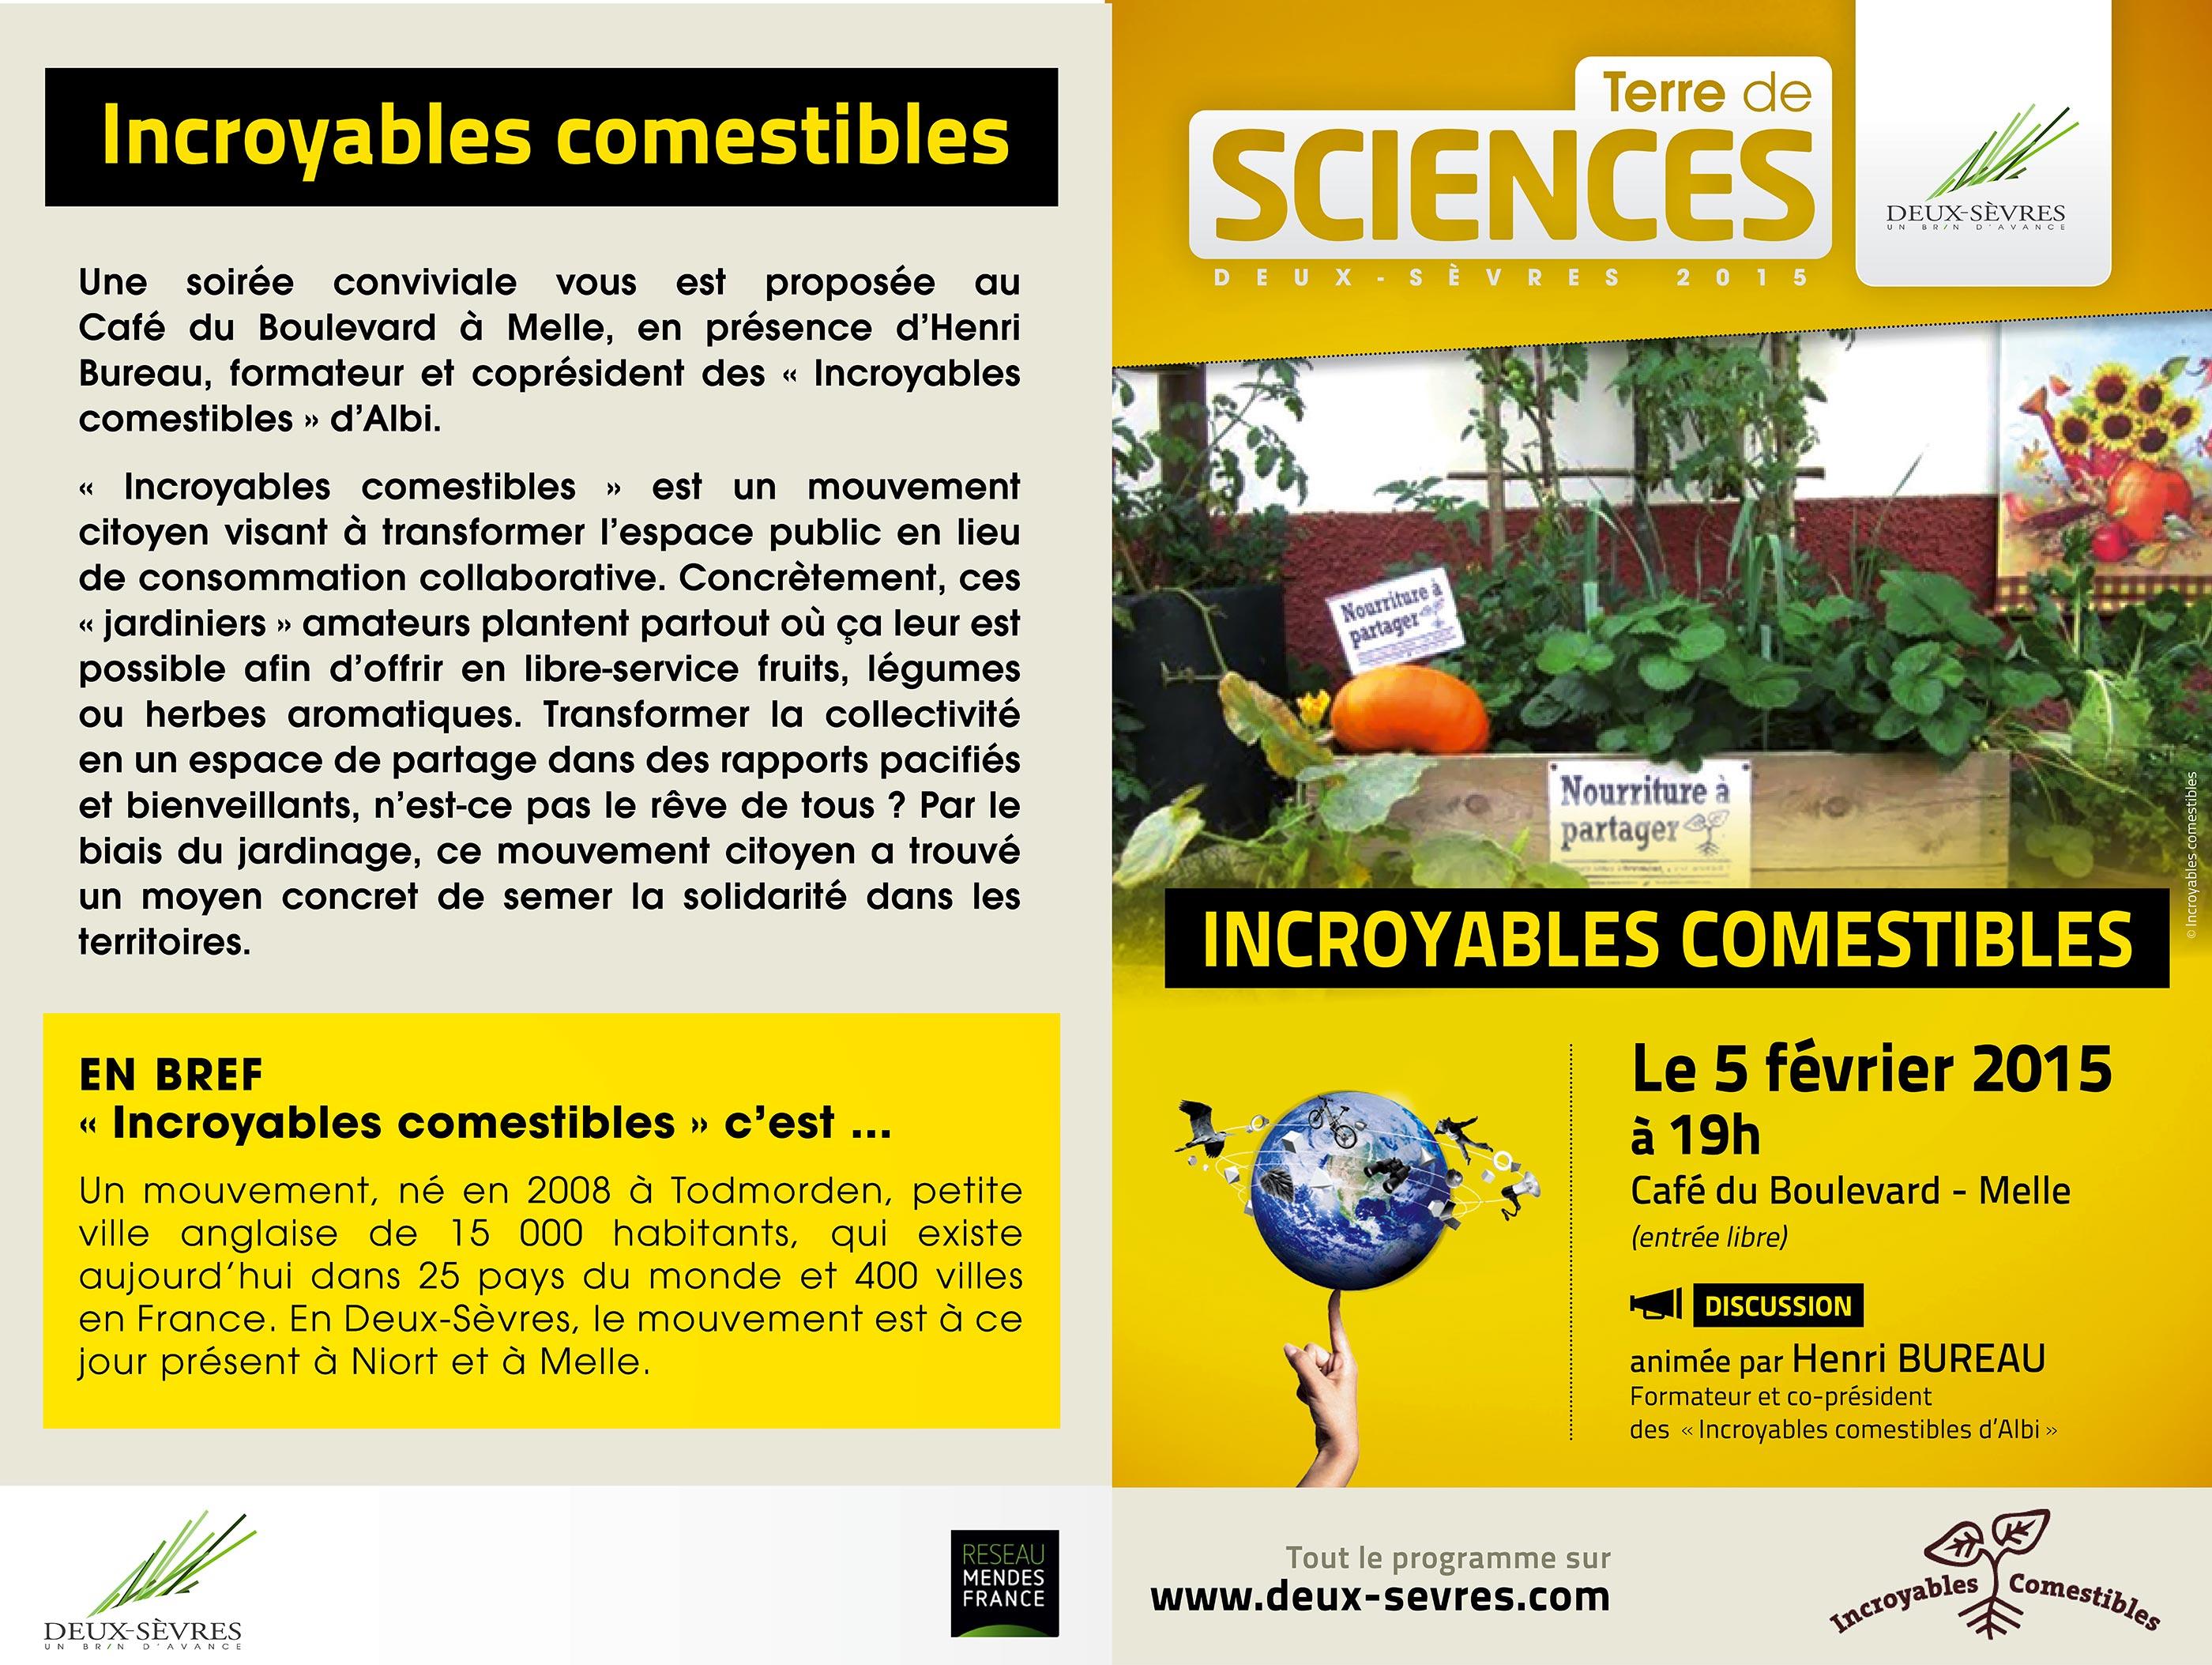 c736_incredible_edible_todmorden_incroyables_comestibles_deux-sevres_melle_niort_w2800